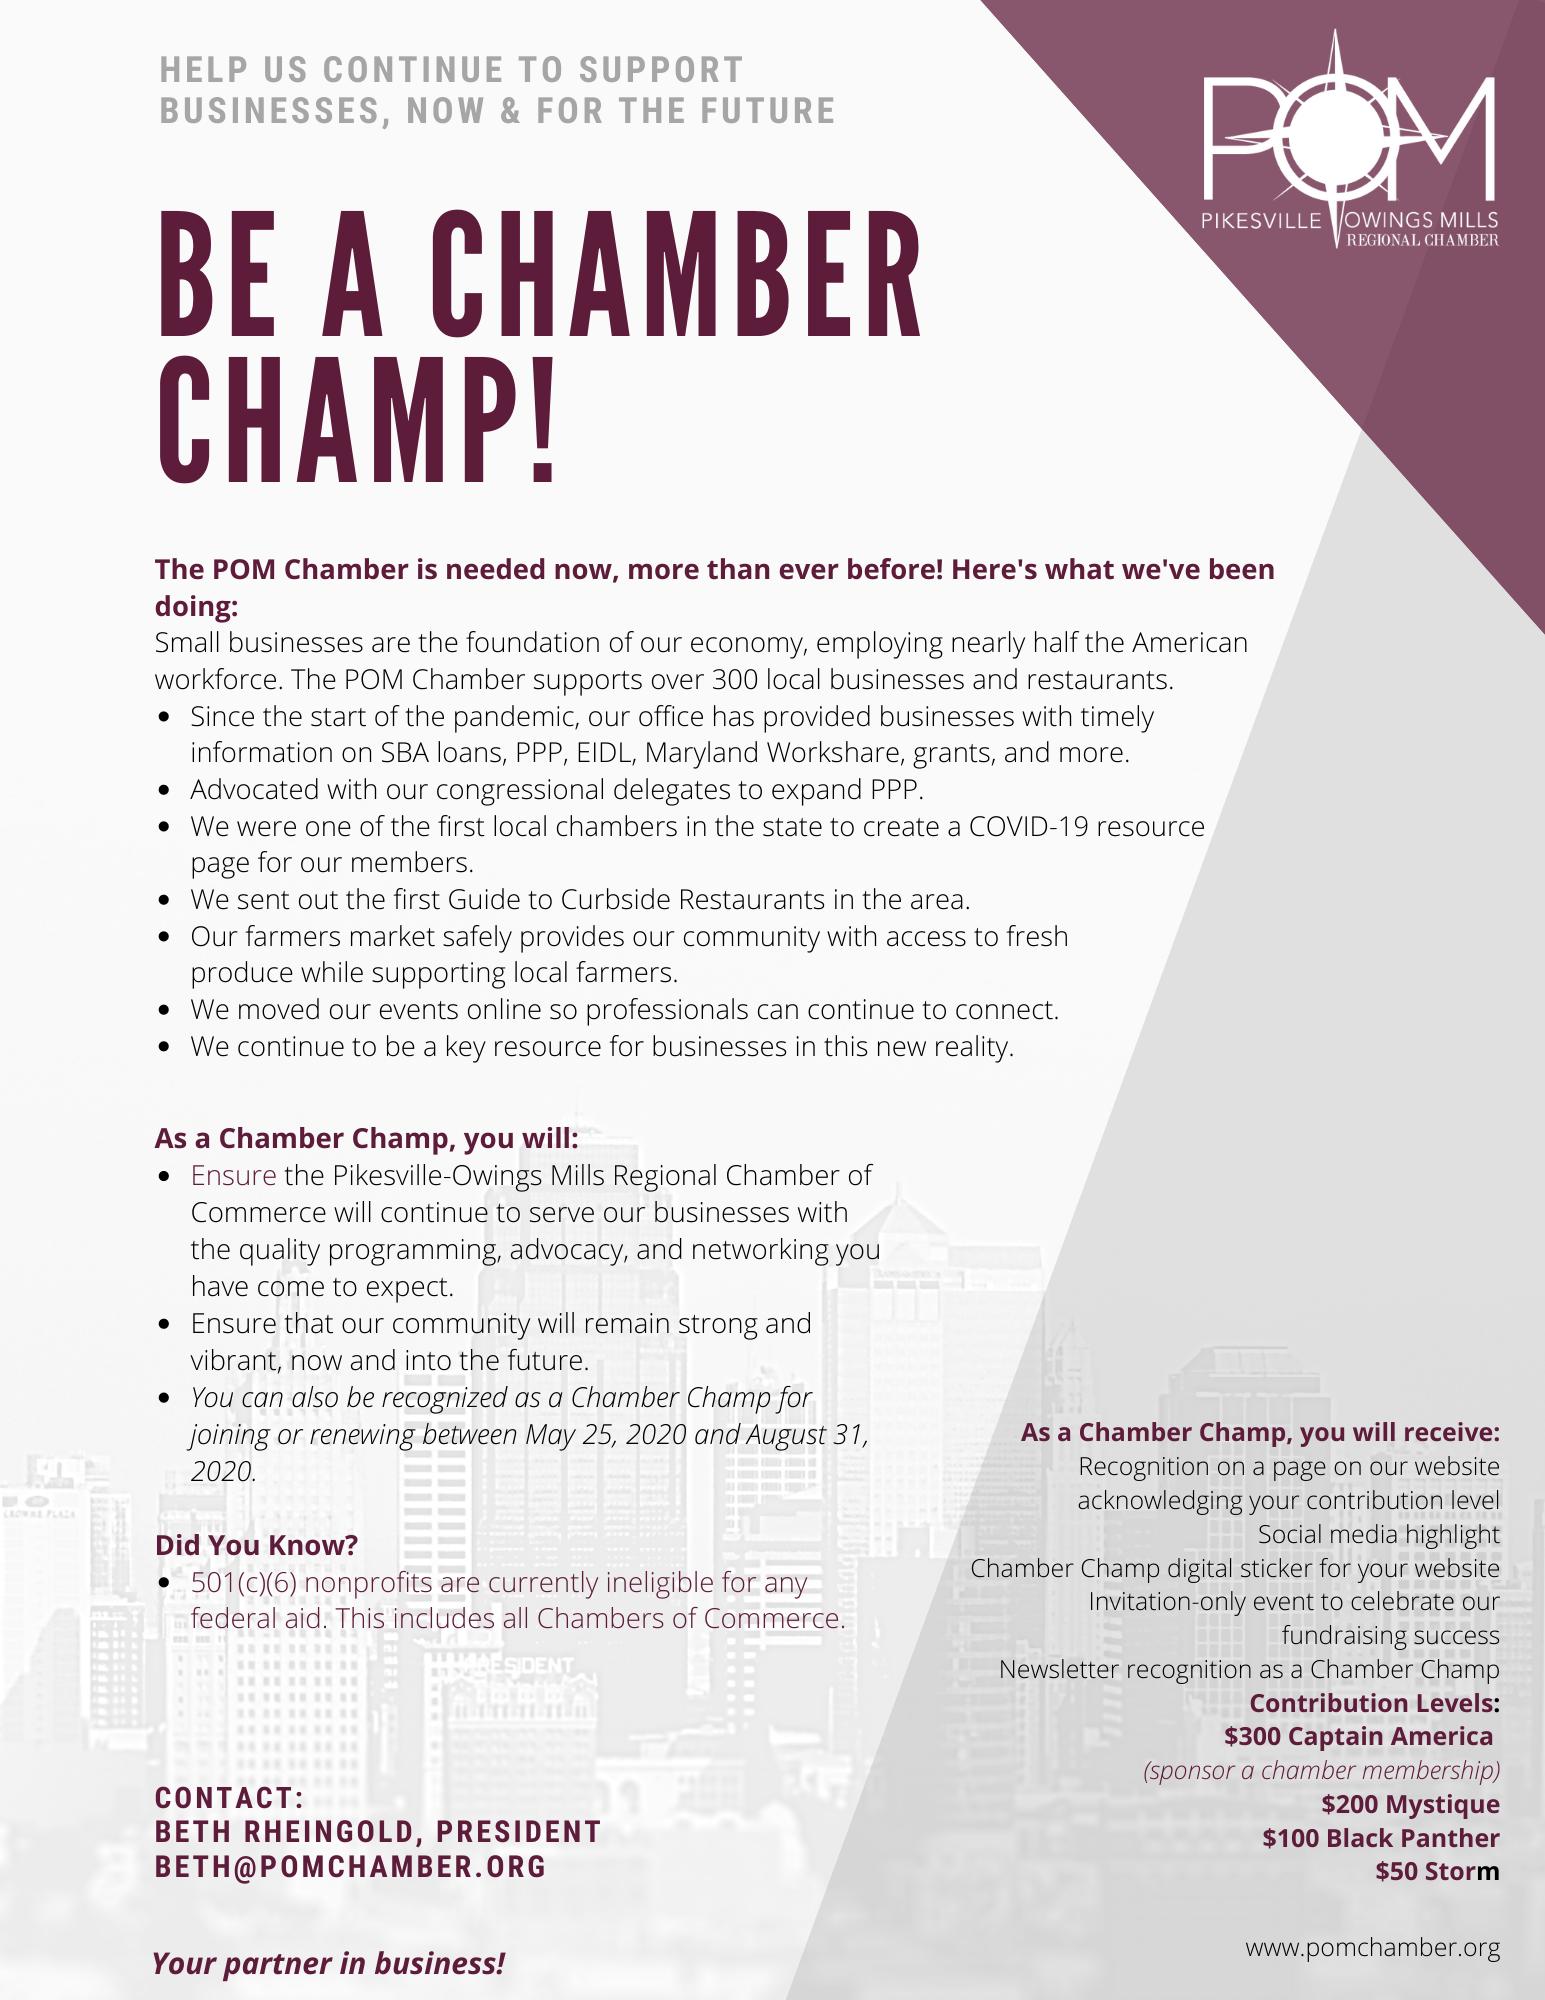 Chamber Champ Details FLyer